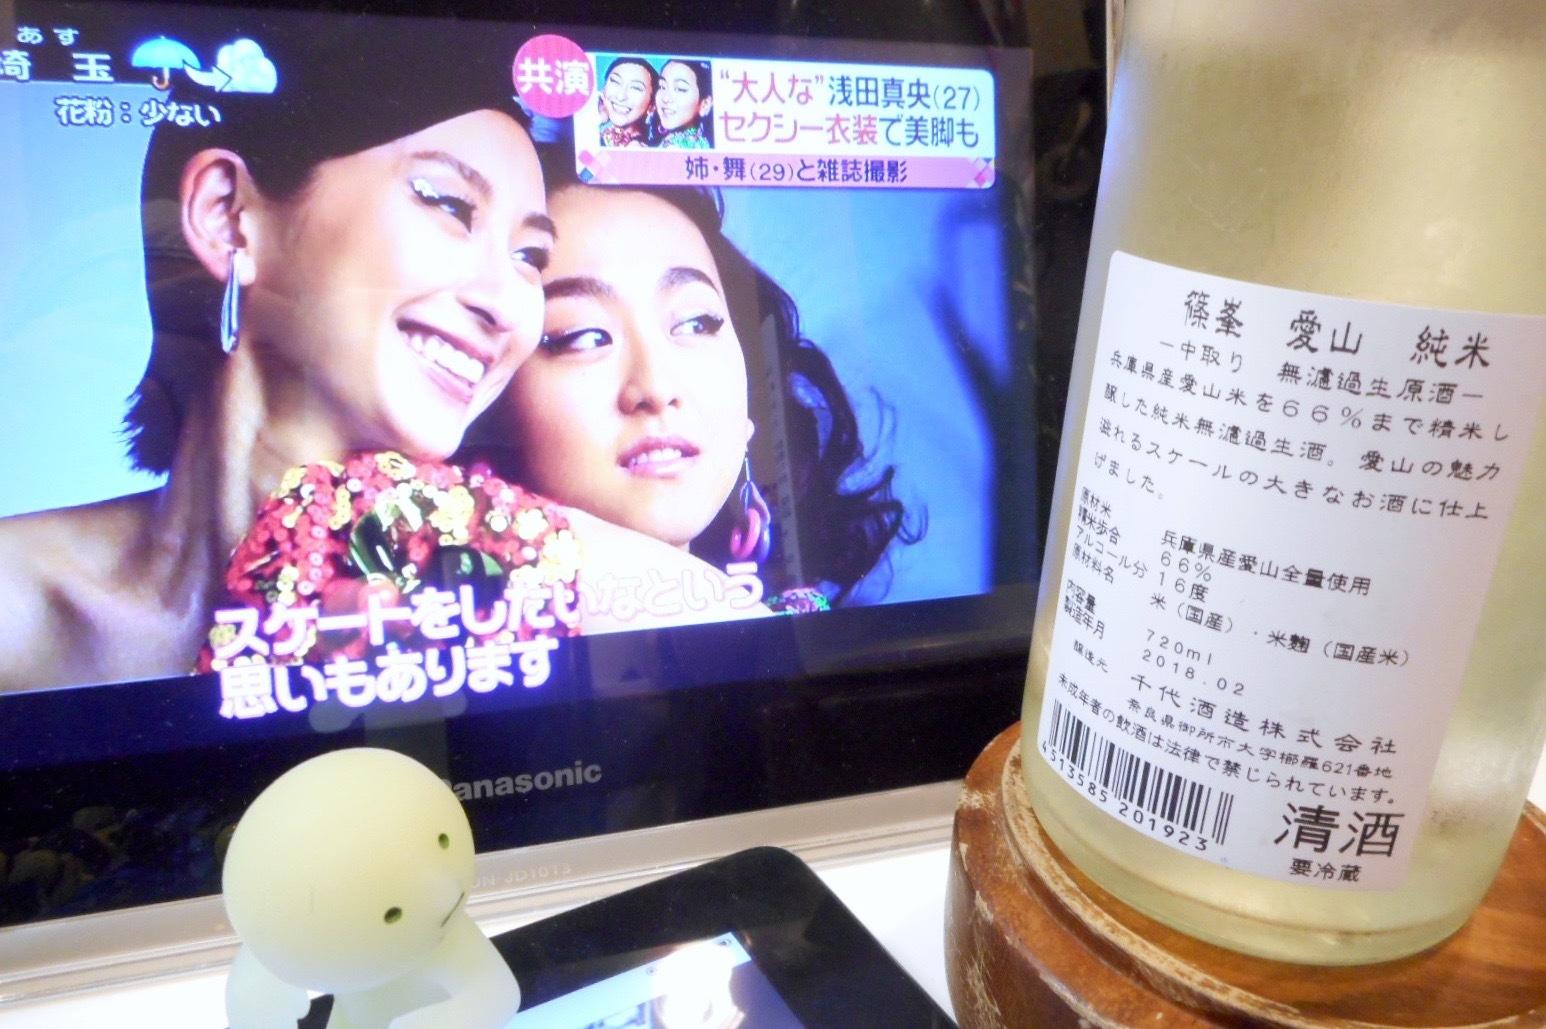 shinomine_aiyama66_29by2.jpg